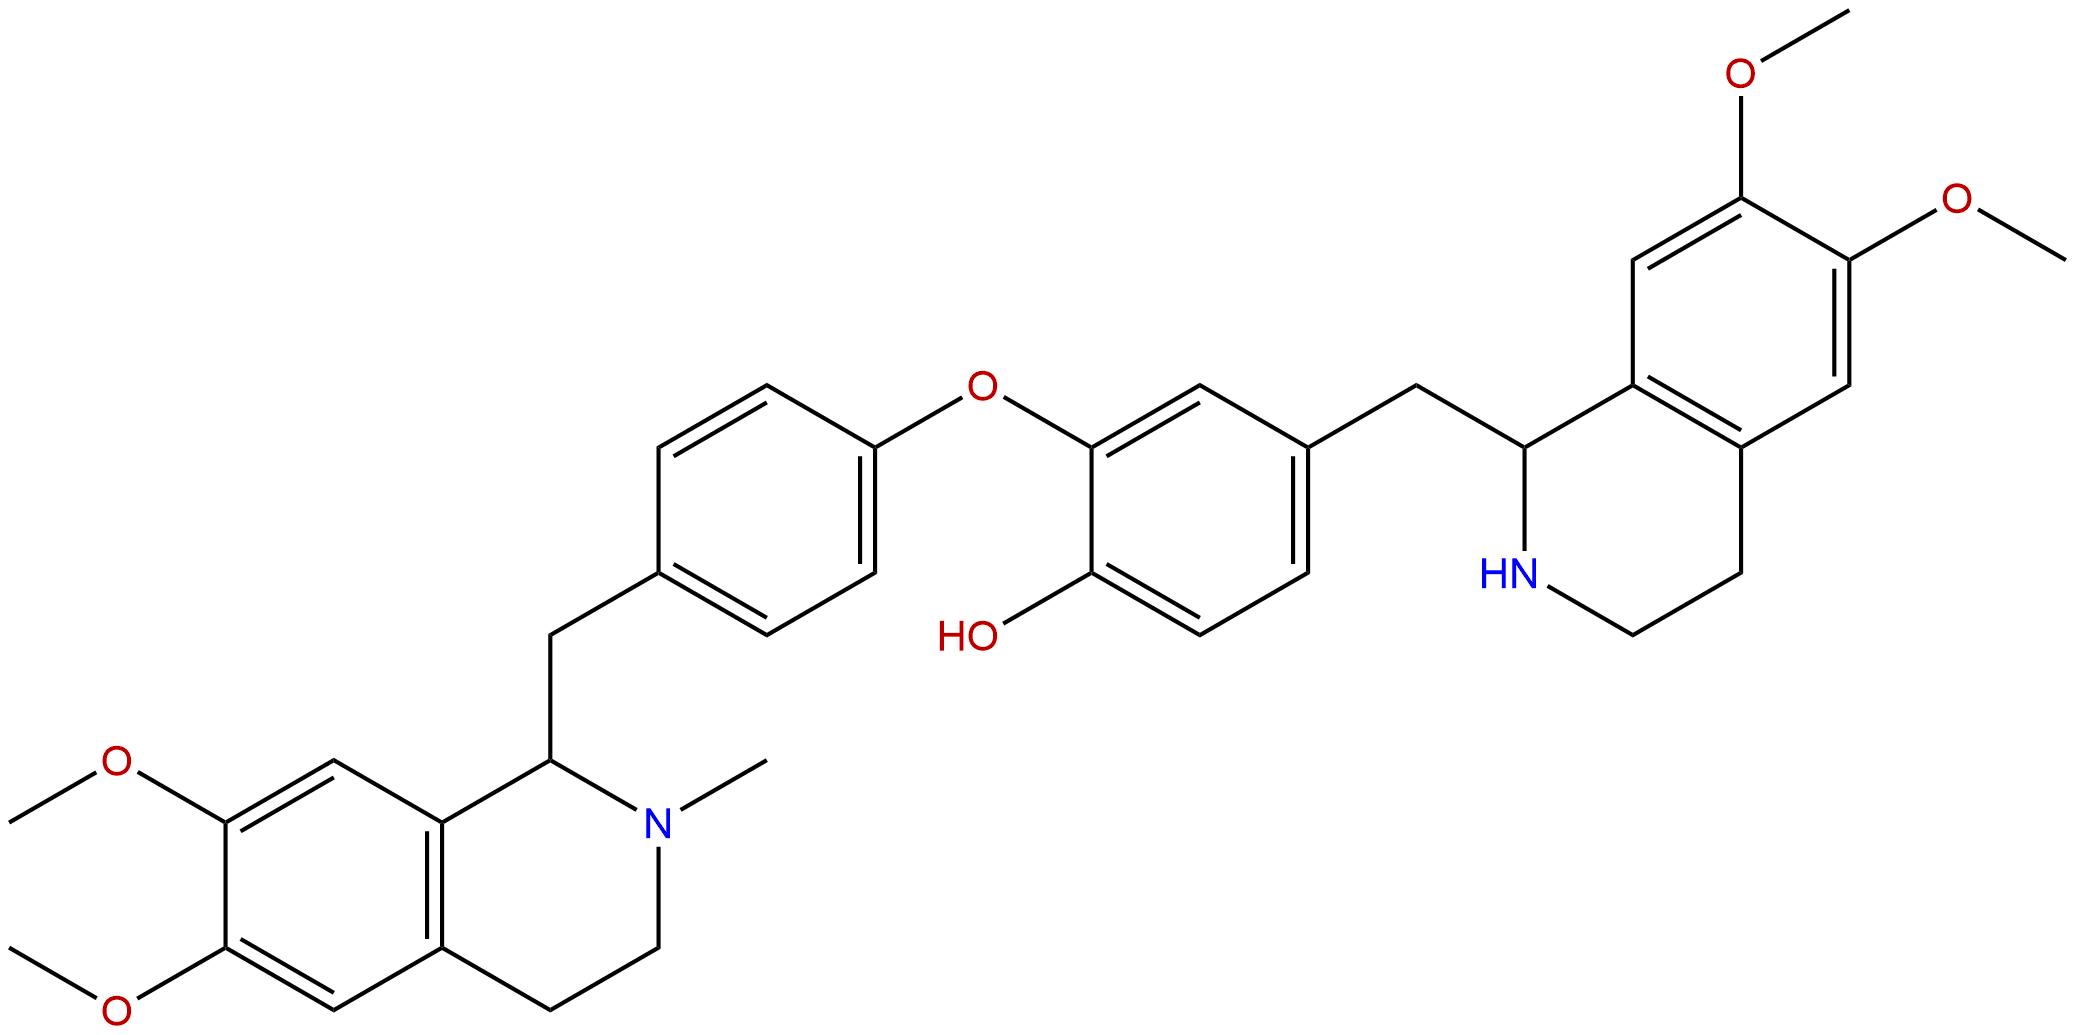 N-desmethyldauricine